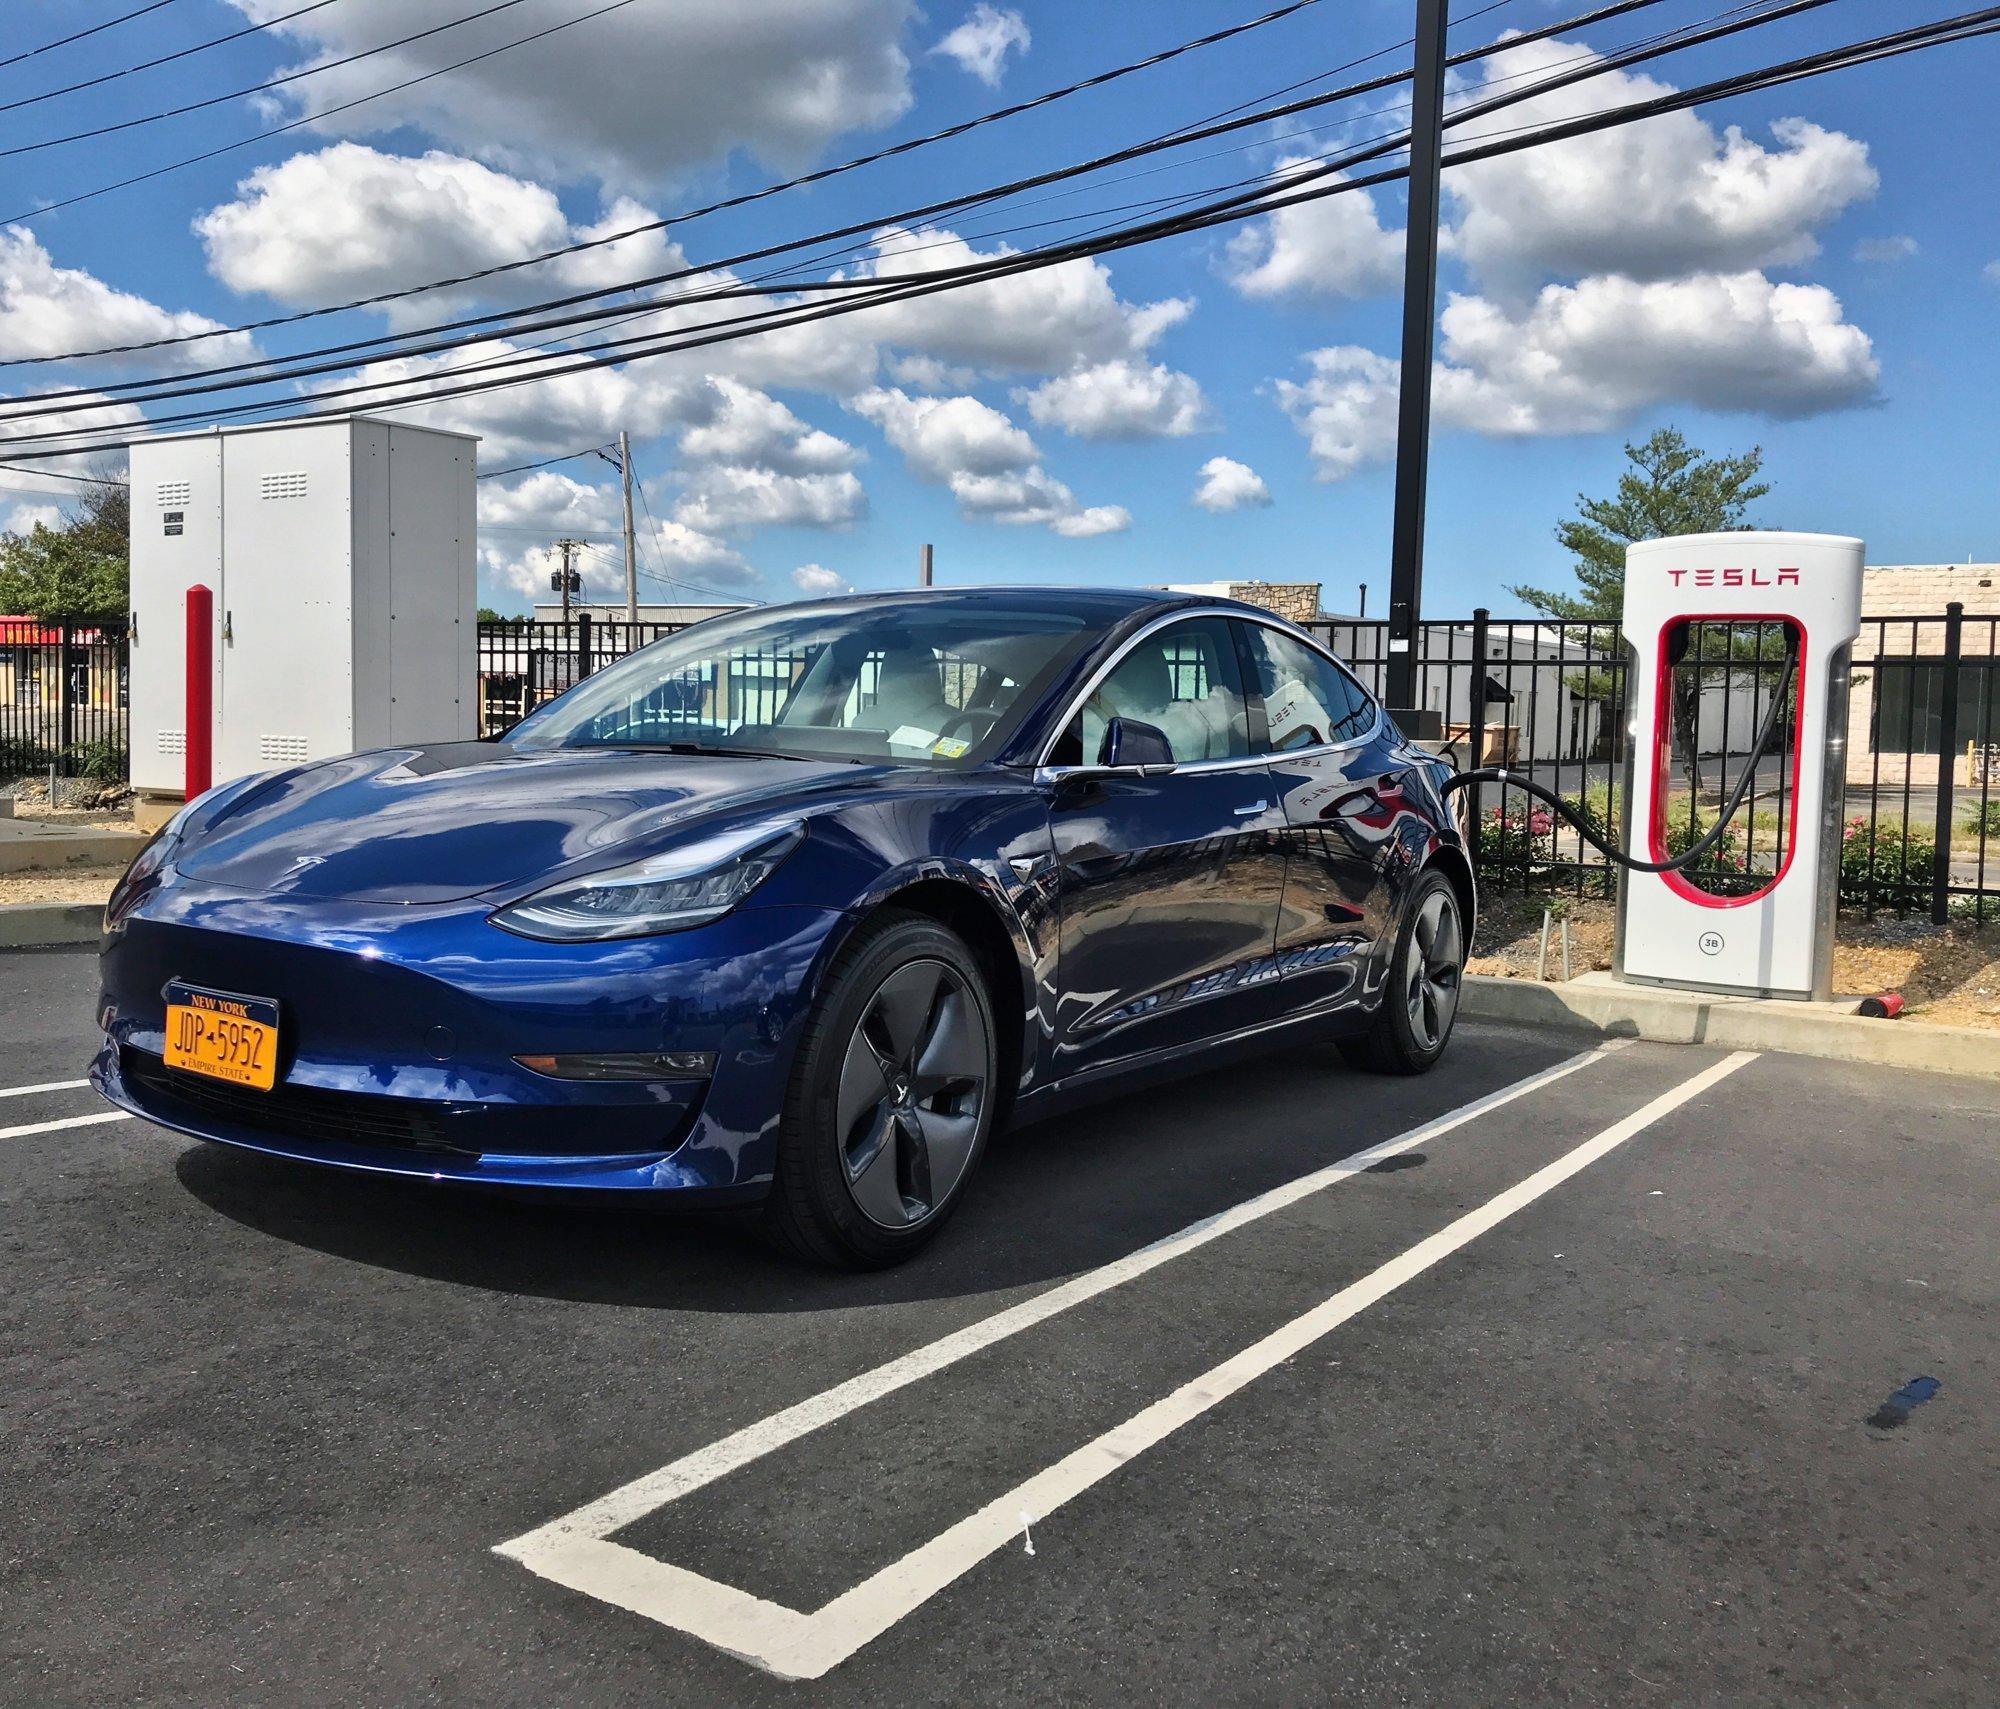 Supercharger: Plainview, NY (Long Island)   Page 5   Tesla